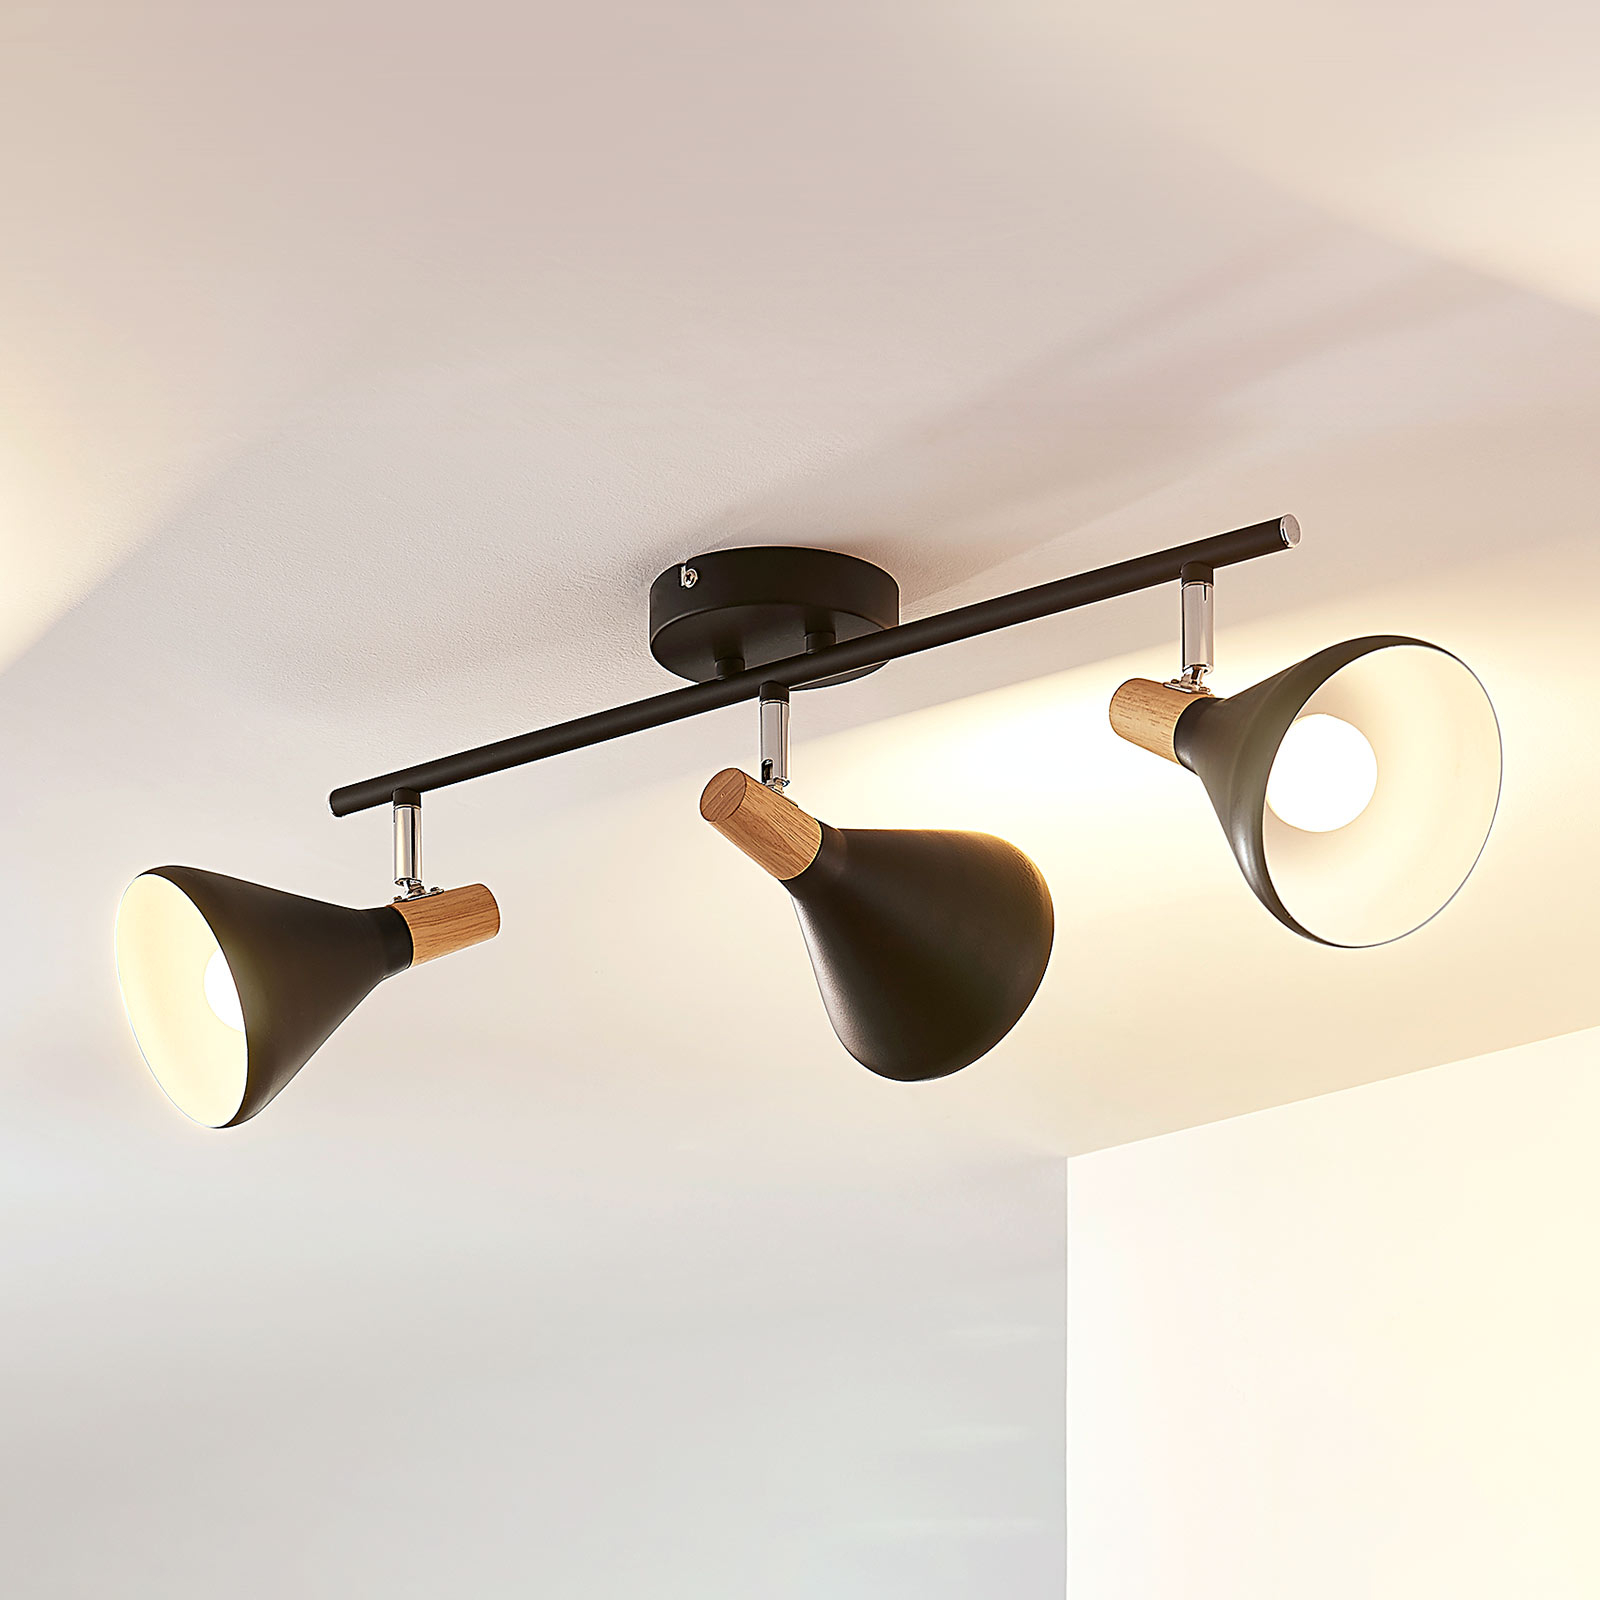 LED loftlampe Arina, skandinavisk stil